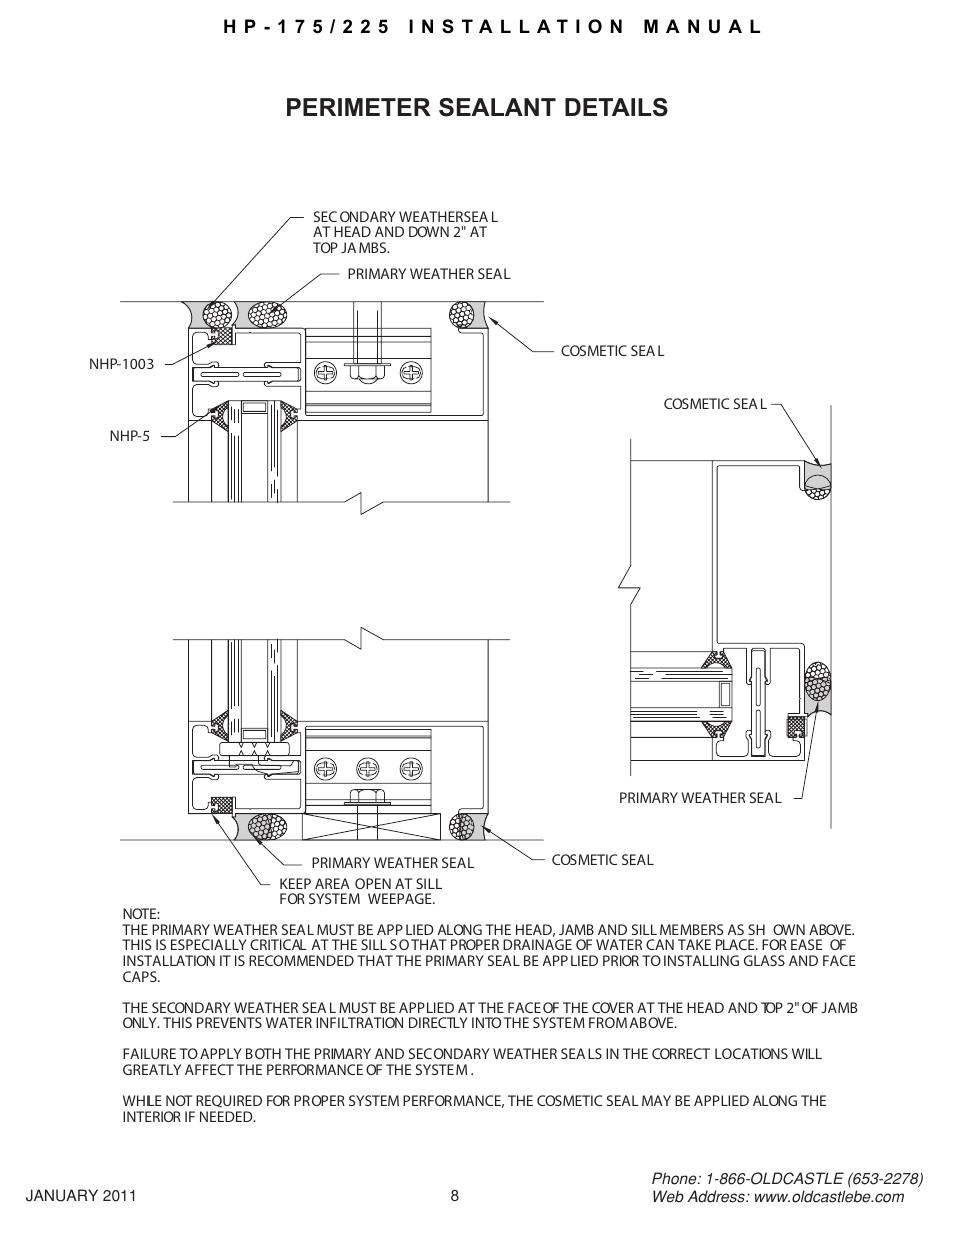 Hp-175-225 08, Perimeter sealant details | Oldcastle